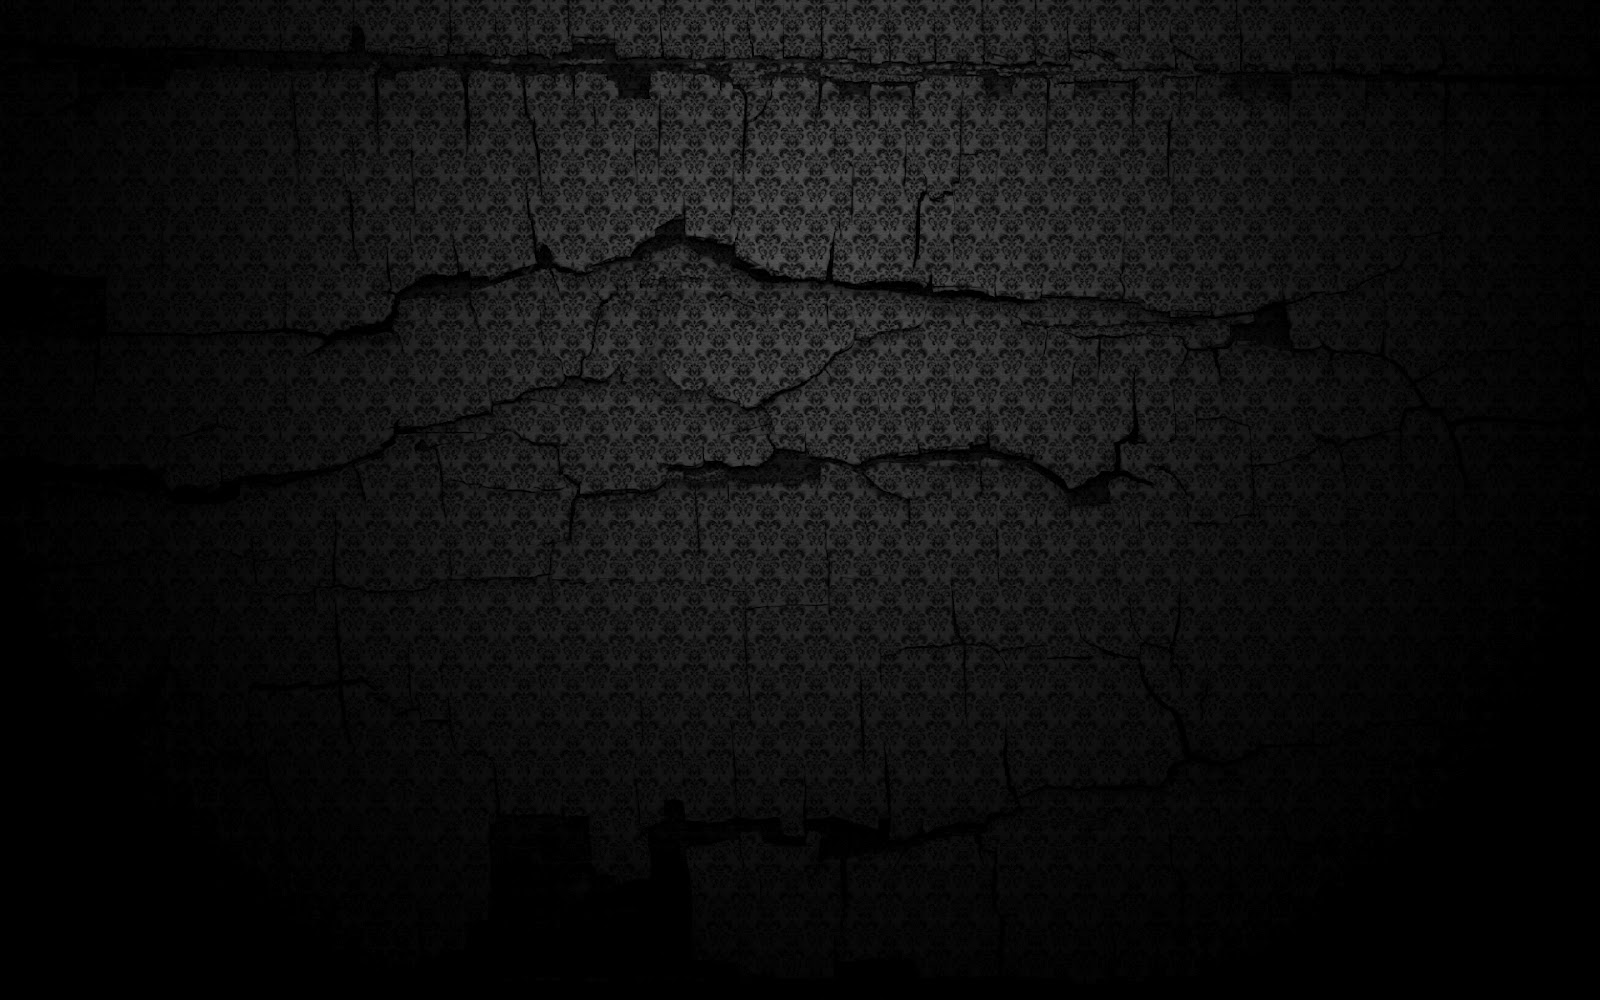 Dark Wall Paper Pattern HD Desktop Wallpaper 1600x1000